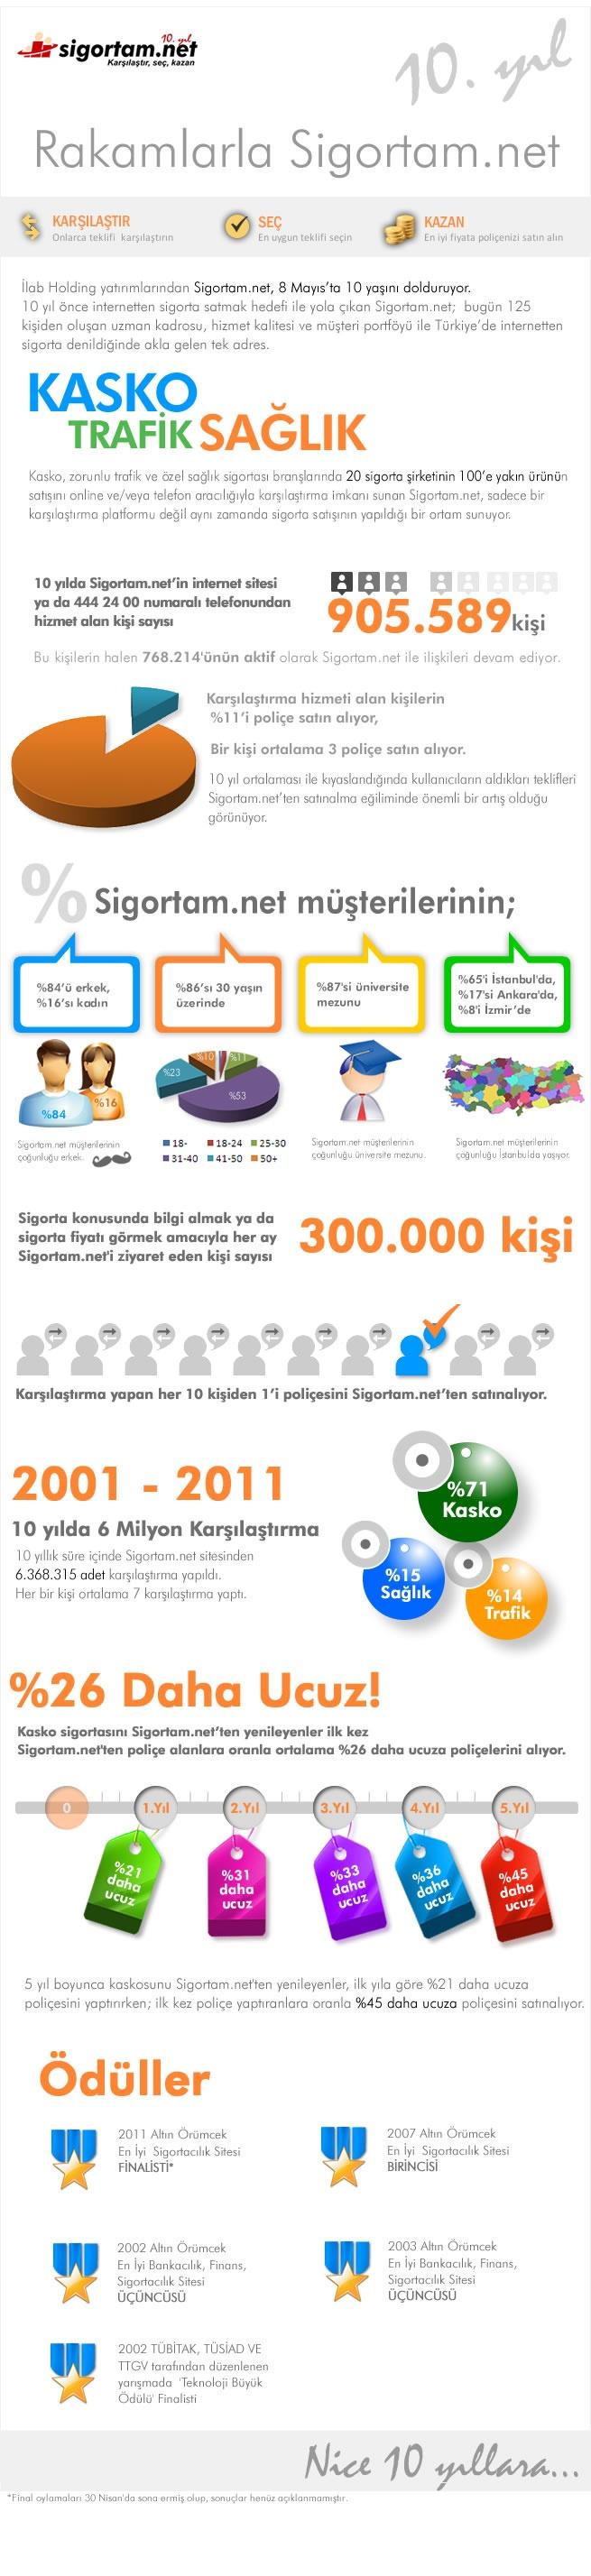 sigortam.net